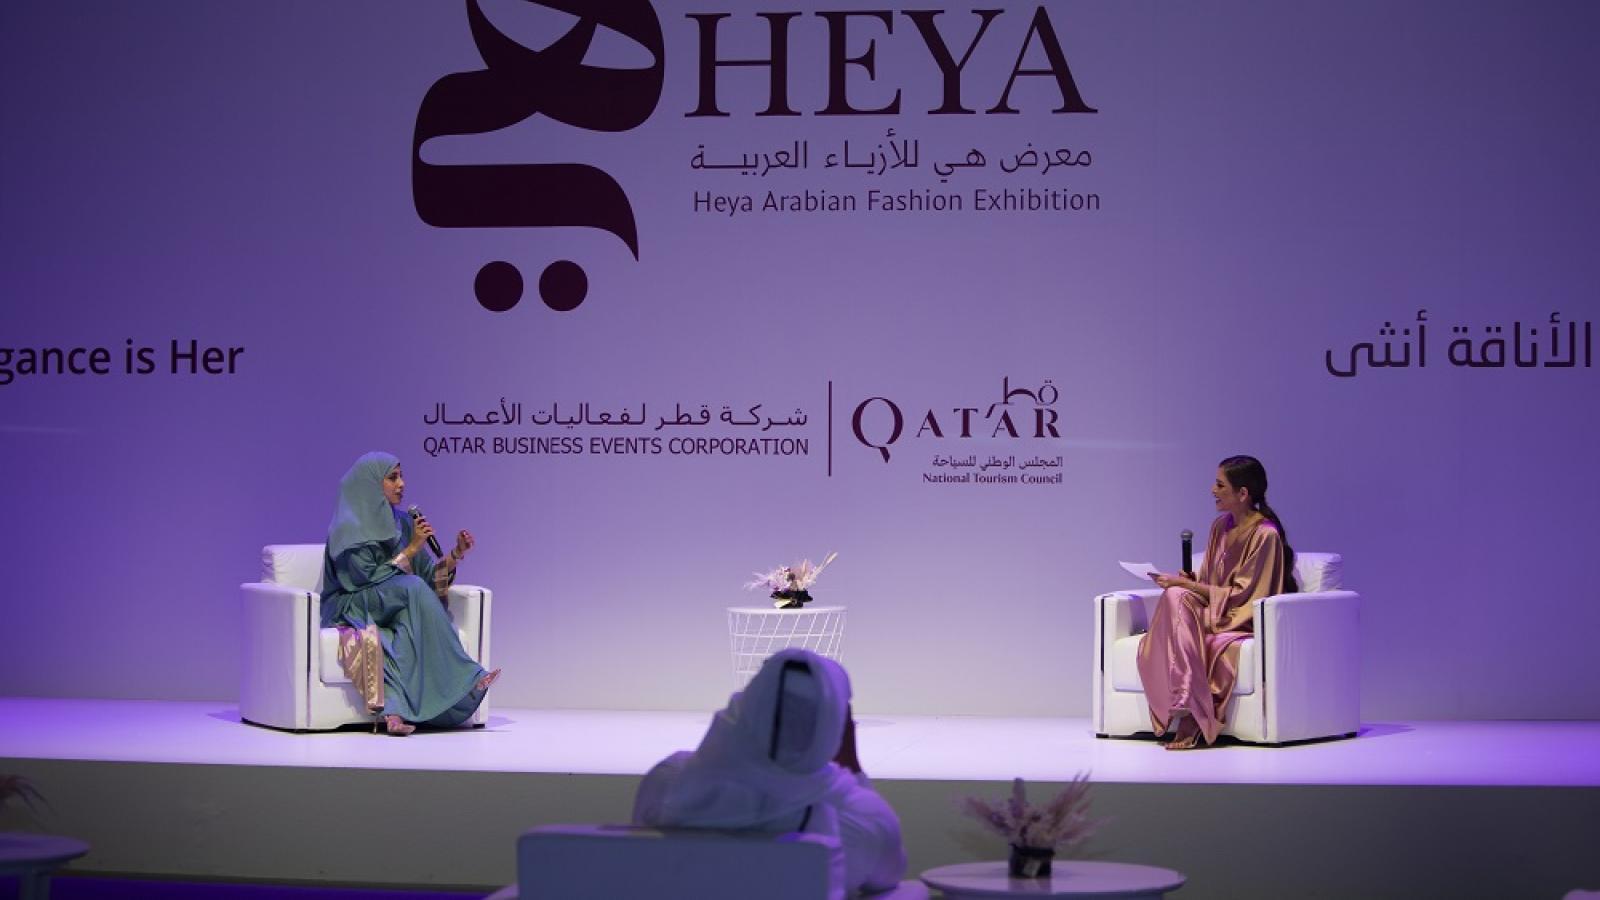 17th Heya Arabian Fashion Exhibition features high profile talks on fashion business